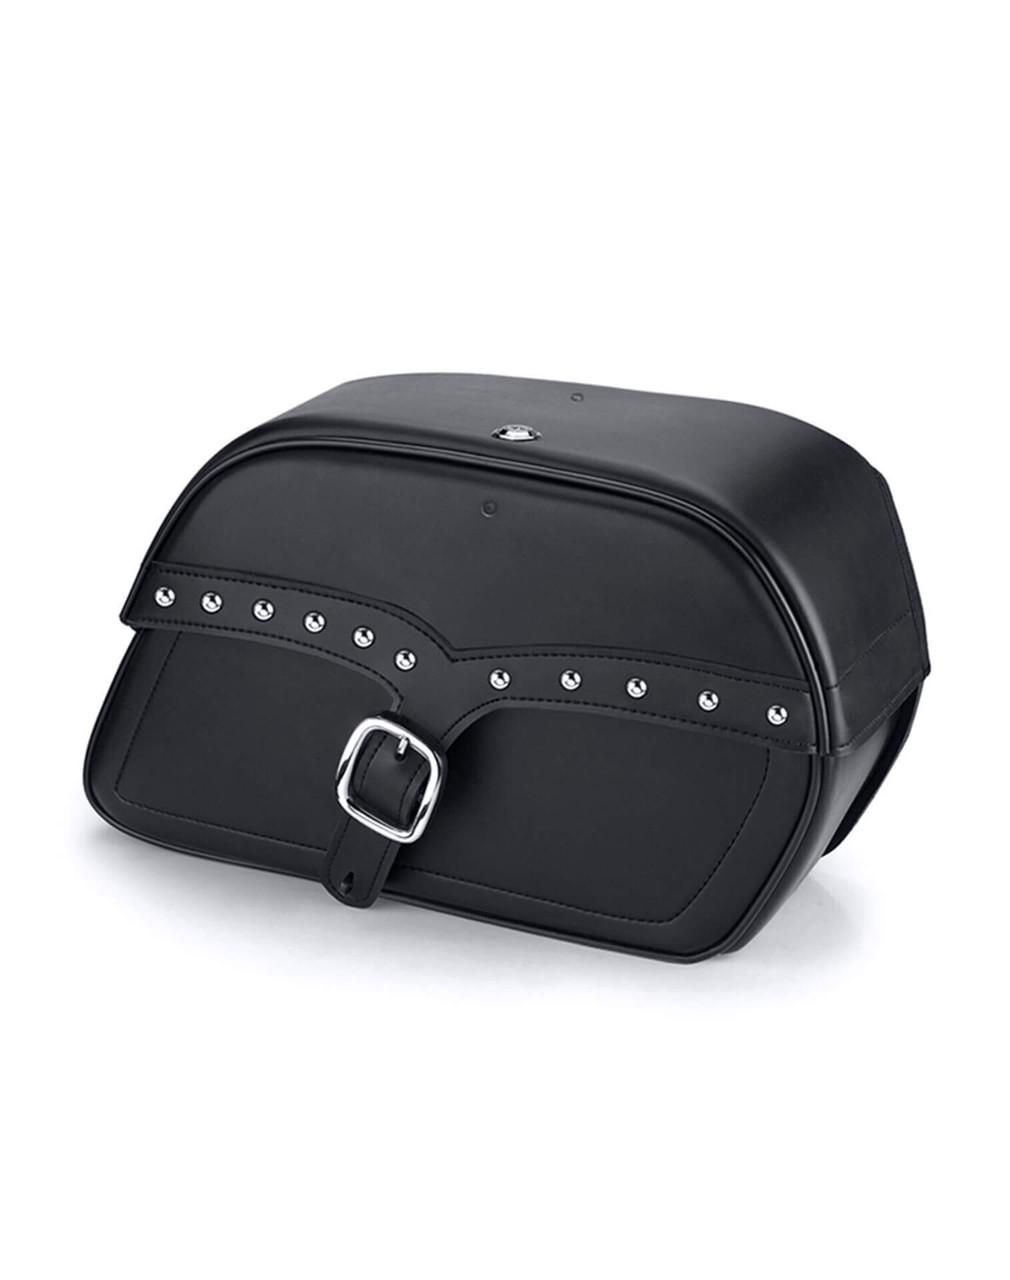 Honda 1100 Shadow Aero Charger Medium Single Strap Studded Motorcycle Saddlebags Main Bag View